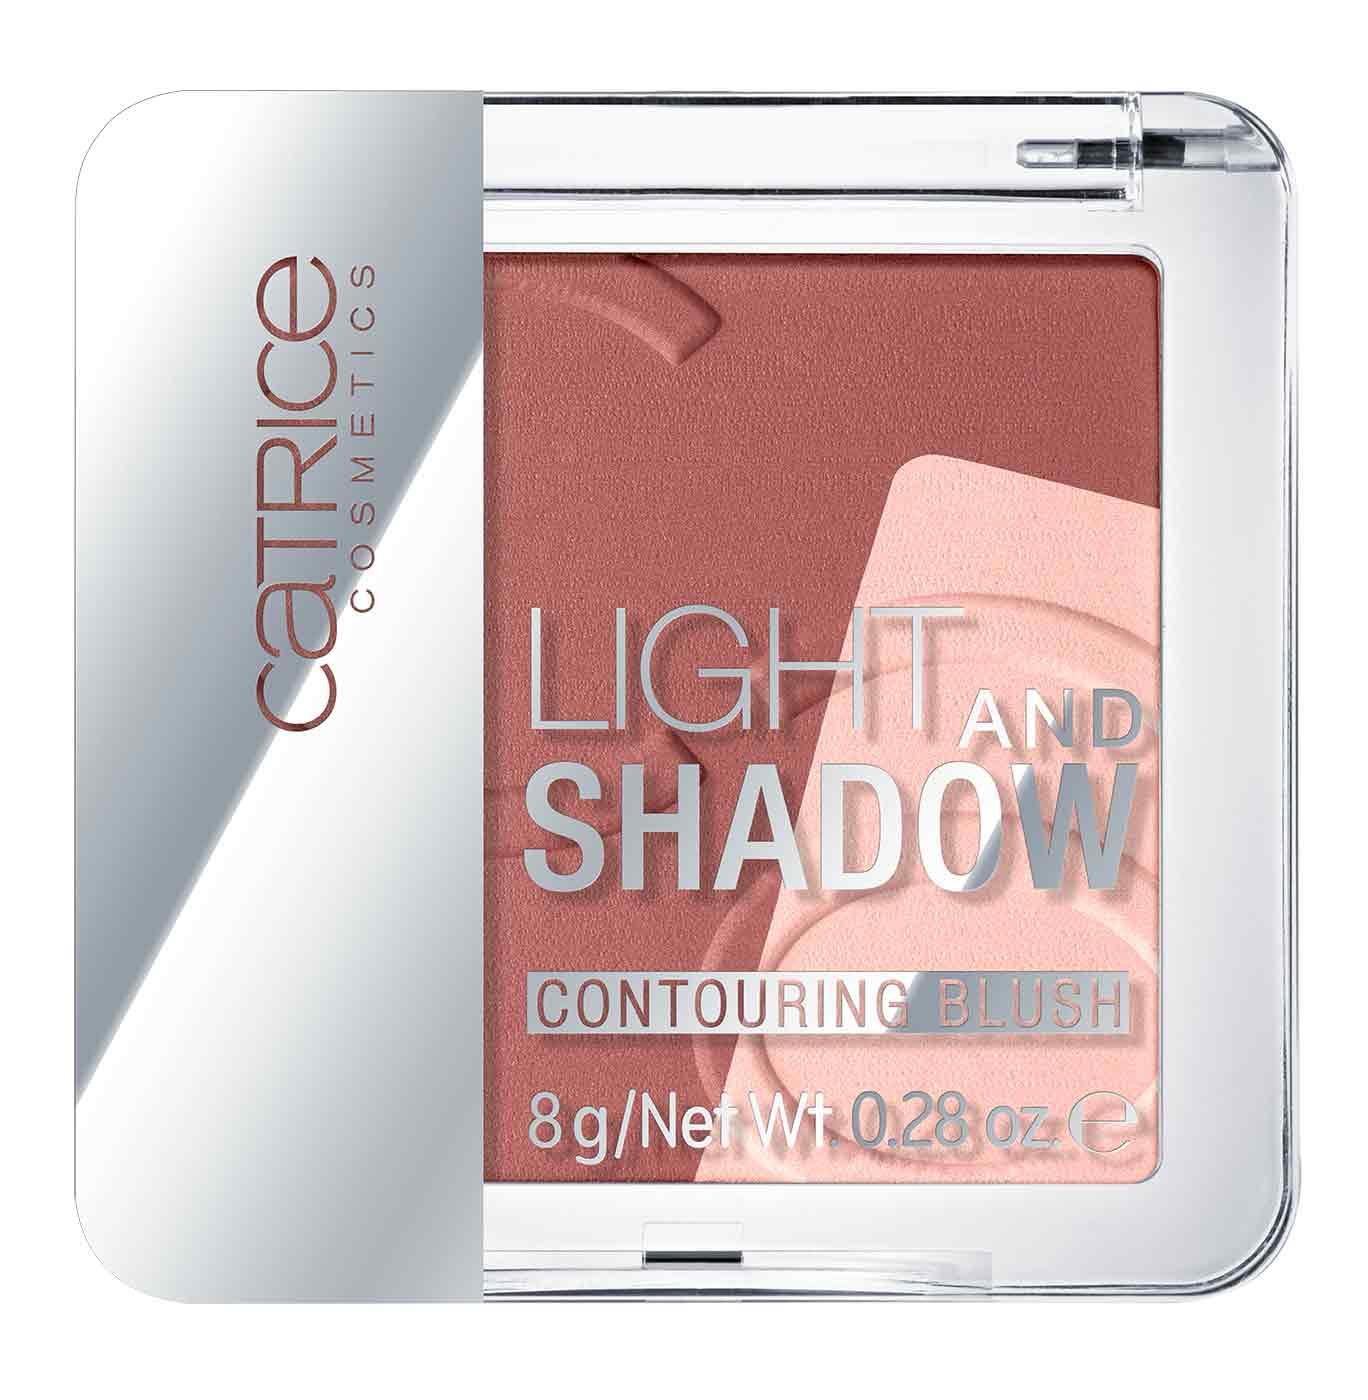 catr_light-shadow-contouring-blush_010_1477492217